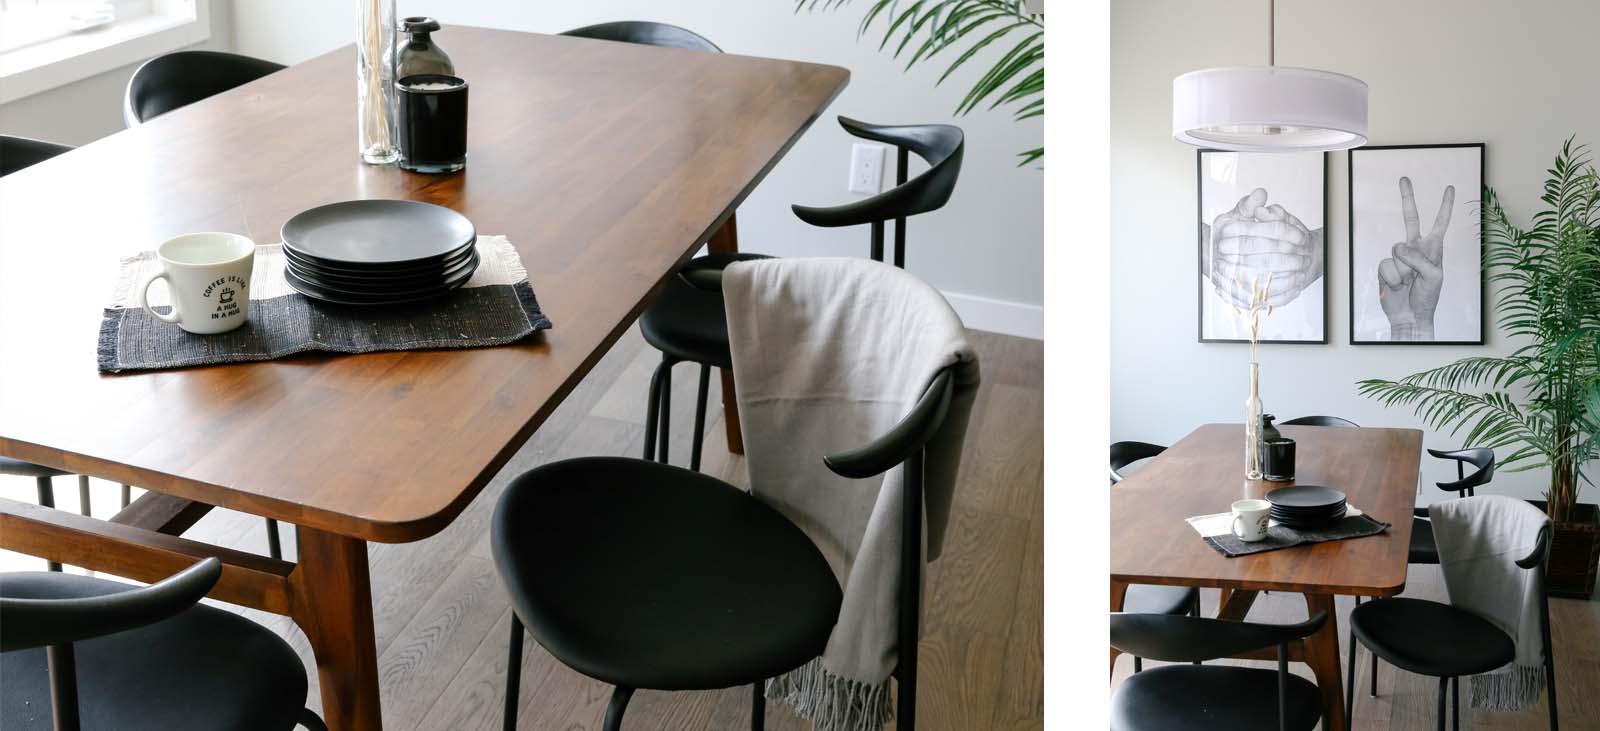 Nicholson by Dream | Real Estate Development Interior Design